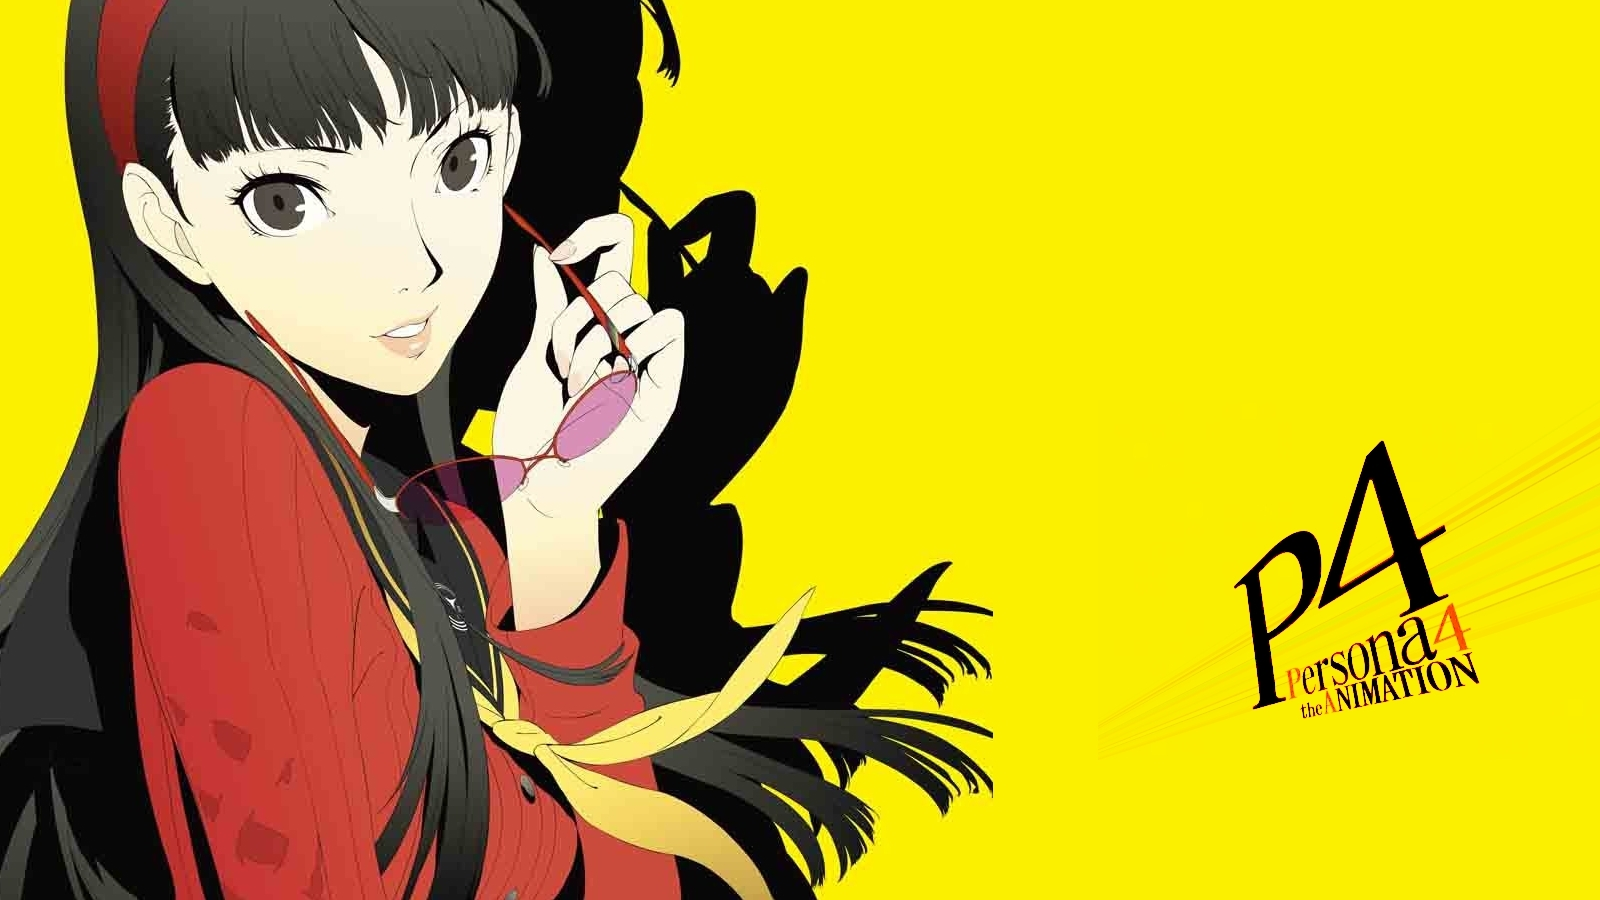 Yukiko_Amagi_Persona_4_Animation_Wallpap